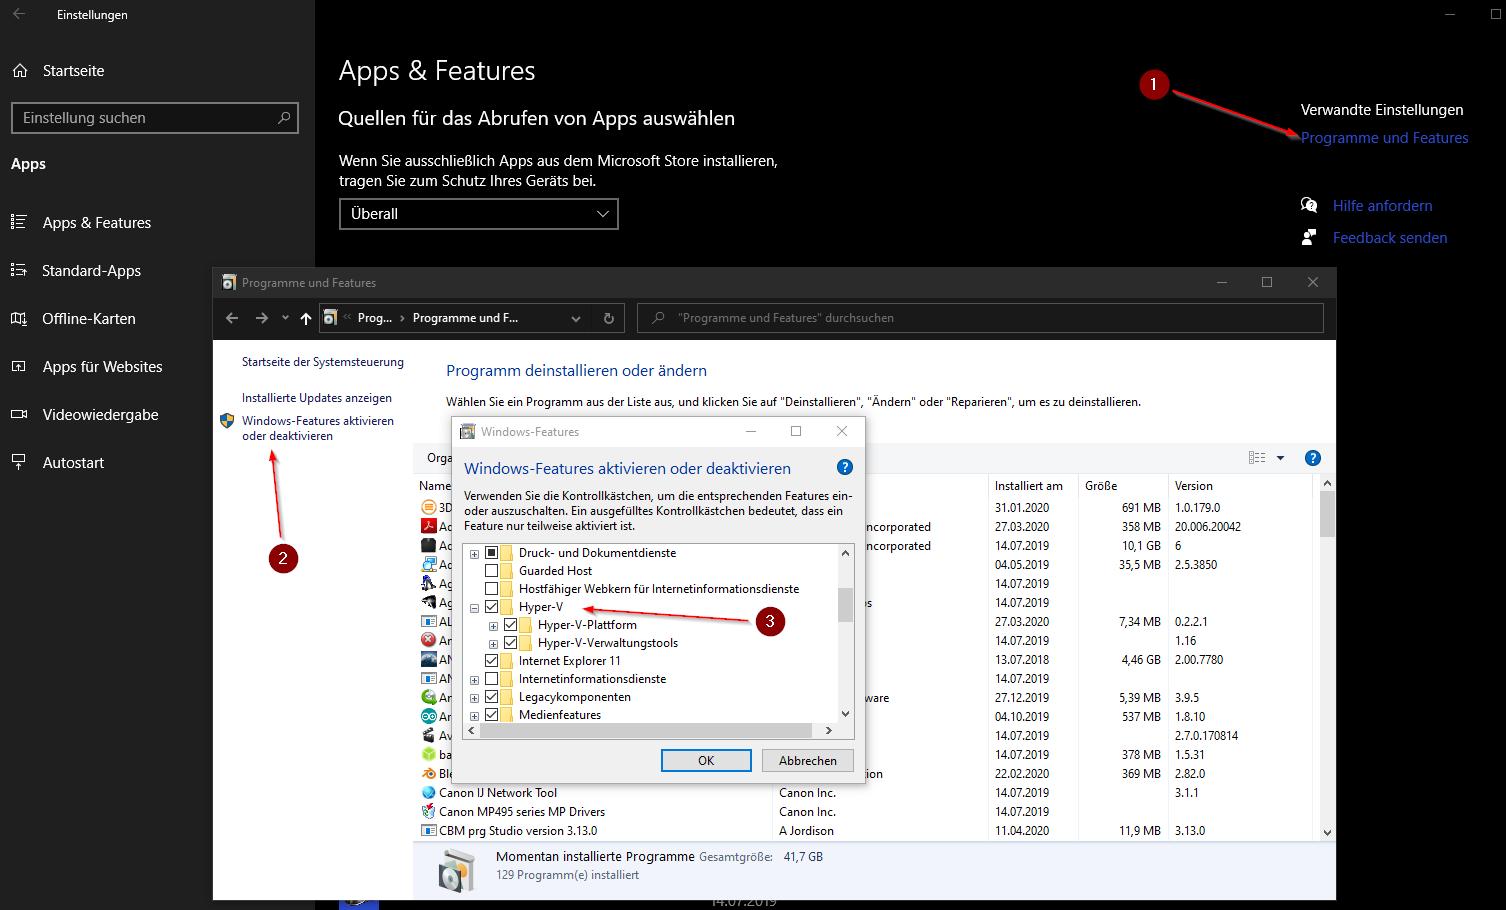 Windows 10 Hyper-V aktivieren